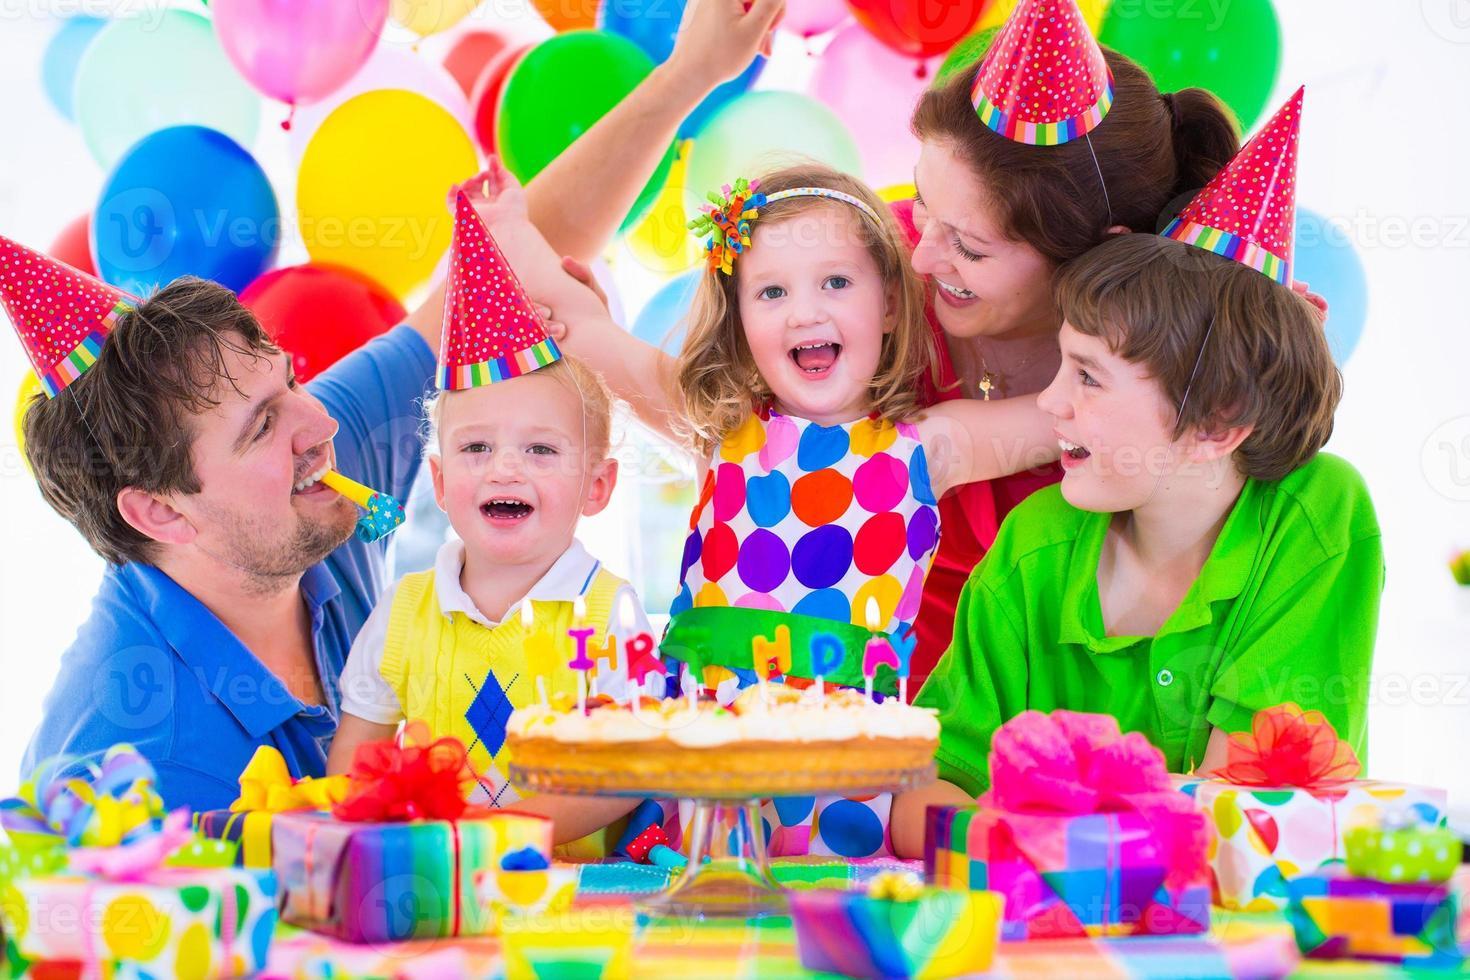 vacker familj firar födelsedagsfest foto